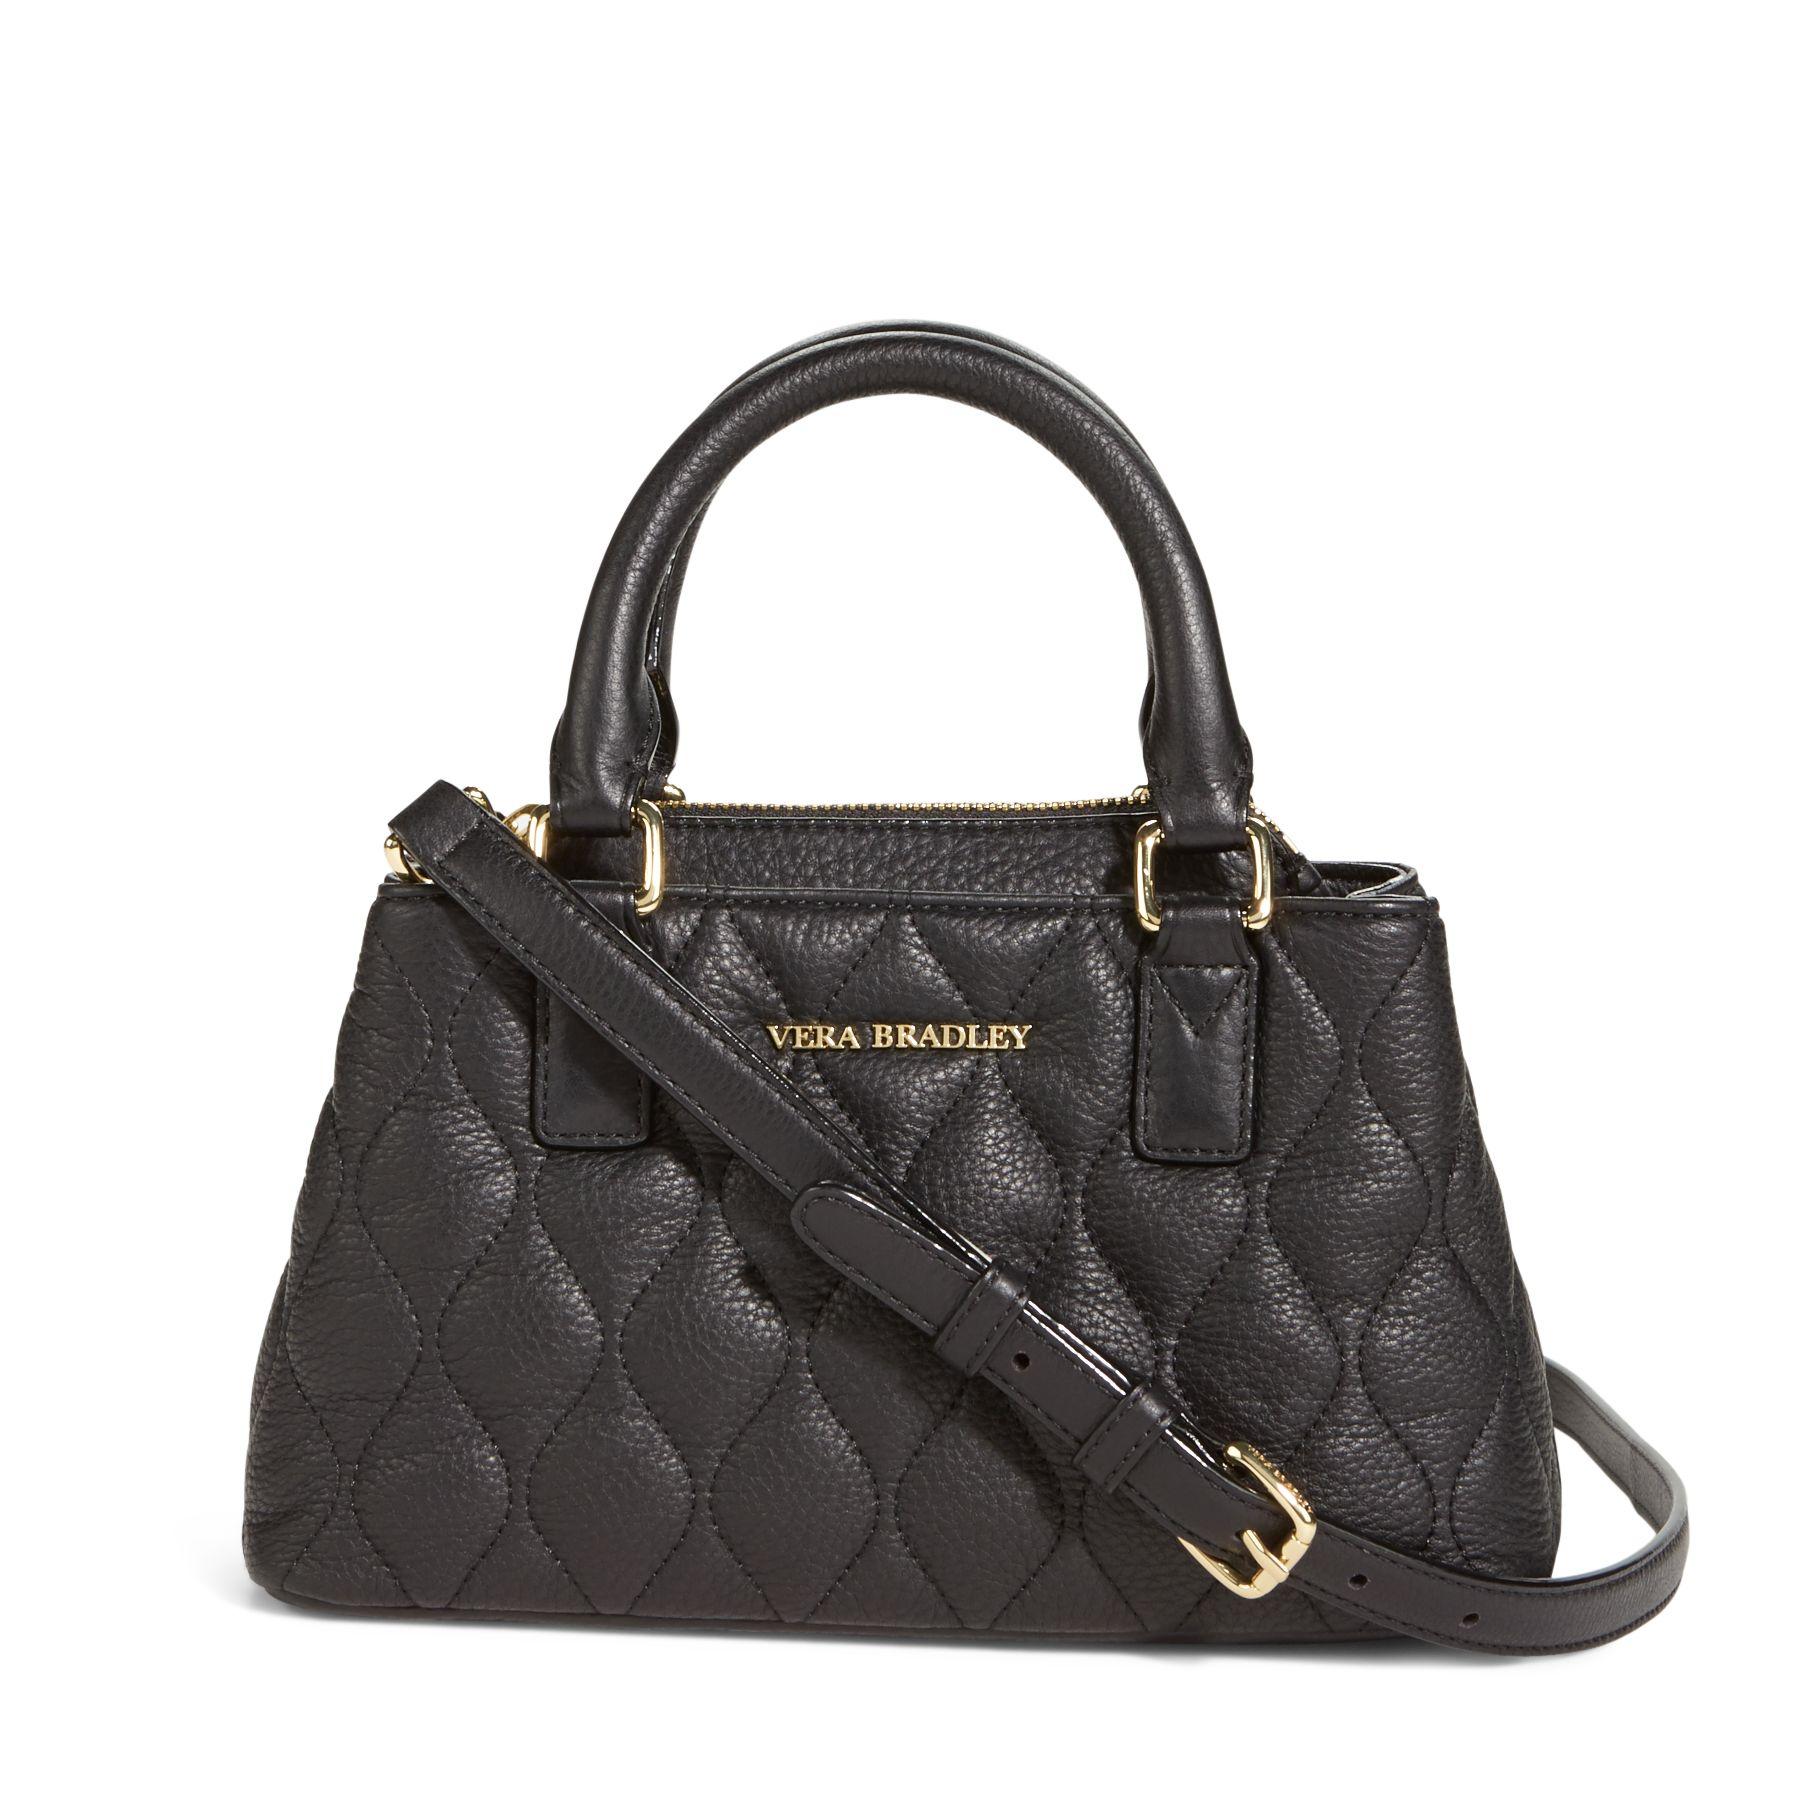 Vera Bradley Quilted Leather Emma Mini Crossbody Bag Ebay